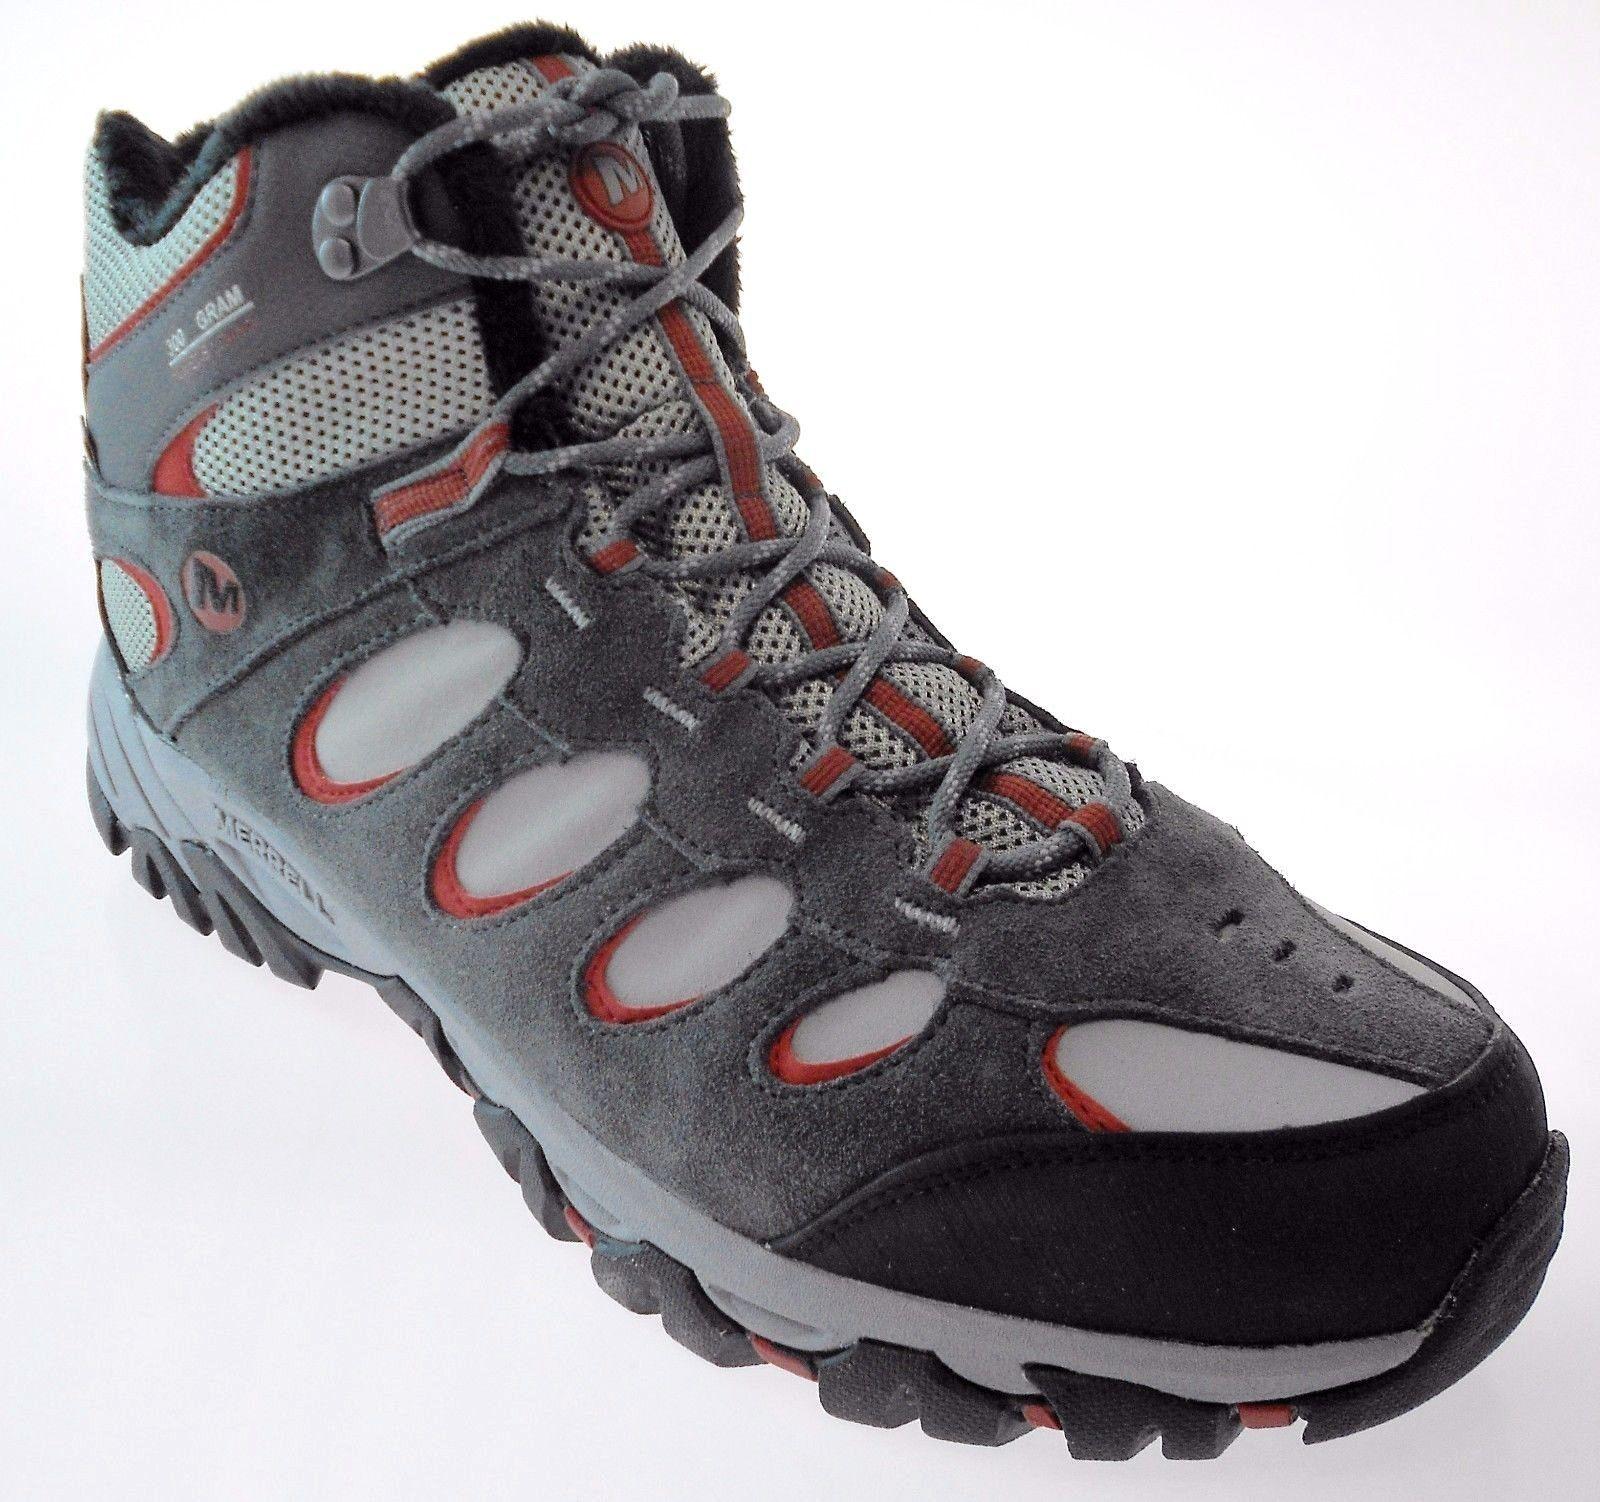 retro heet product uitchecken Merrell Ridgepass Thermo Mid Waterproof and 50 similar items